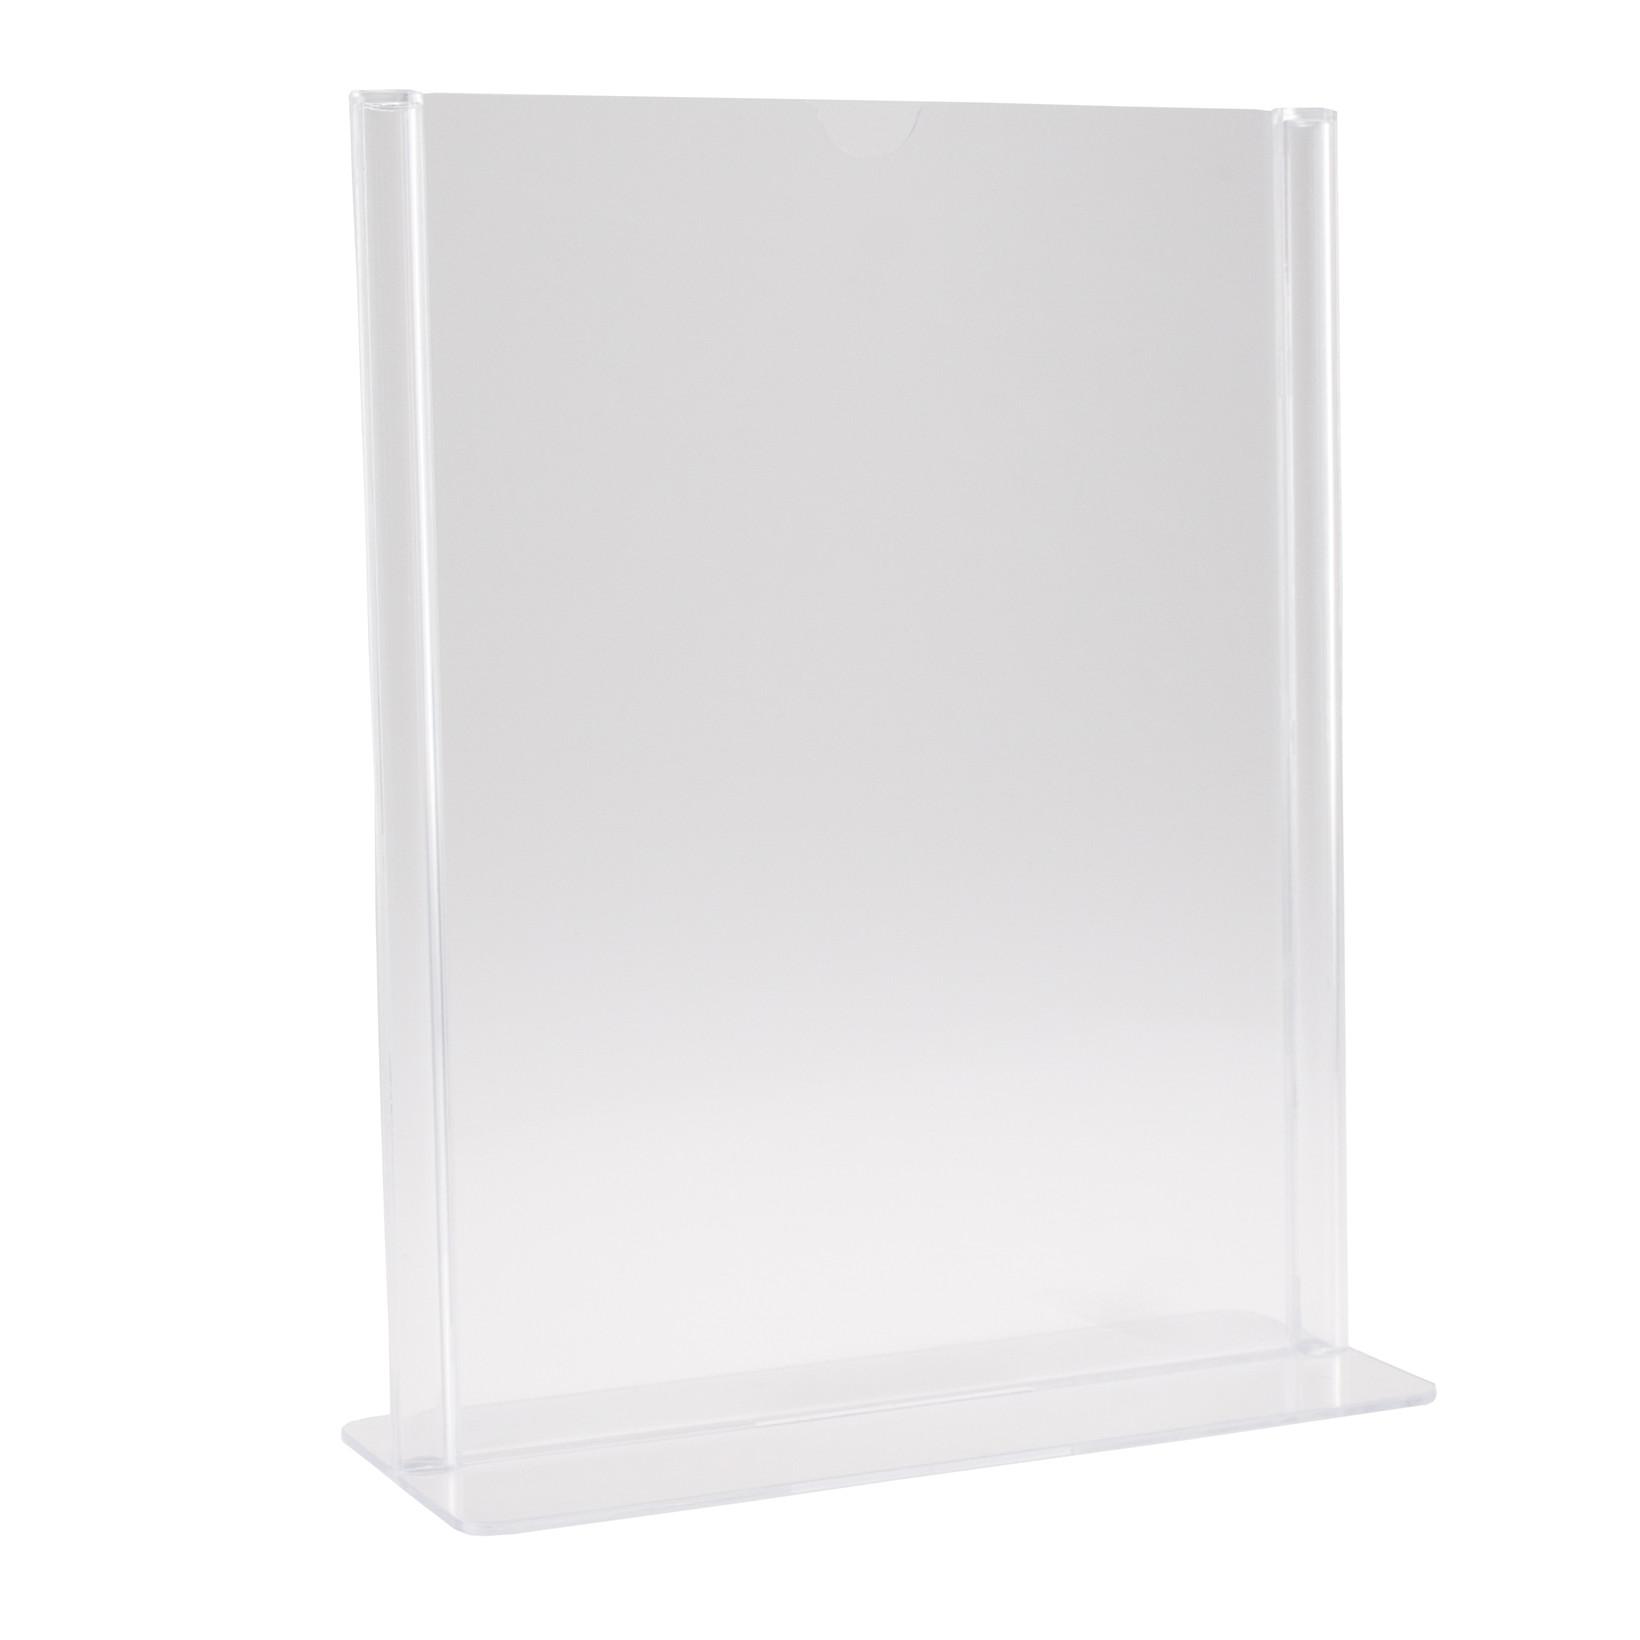 Brochuredisplay BNT A6 klar T-form t/bord 148x105mm